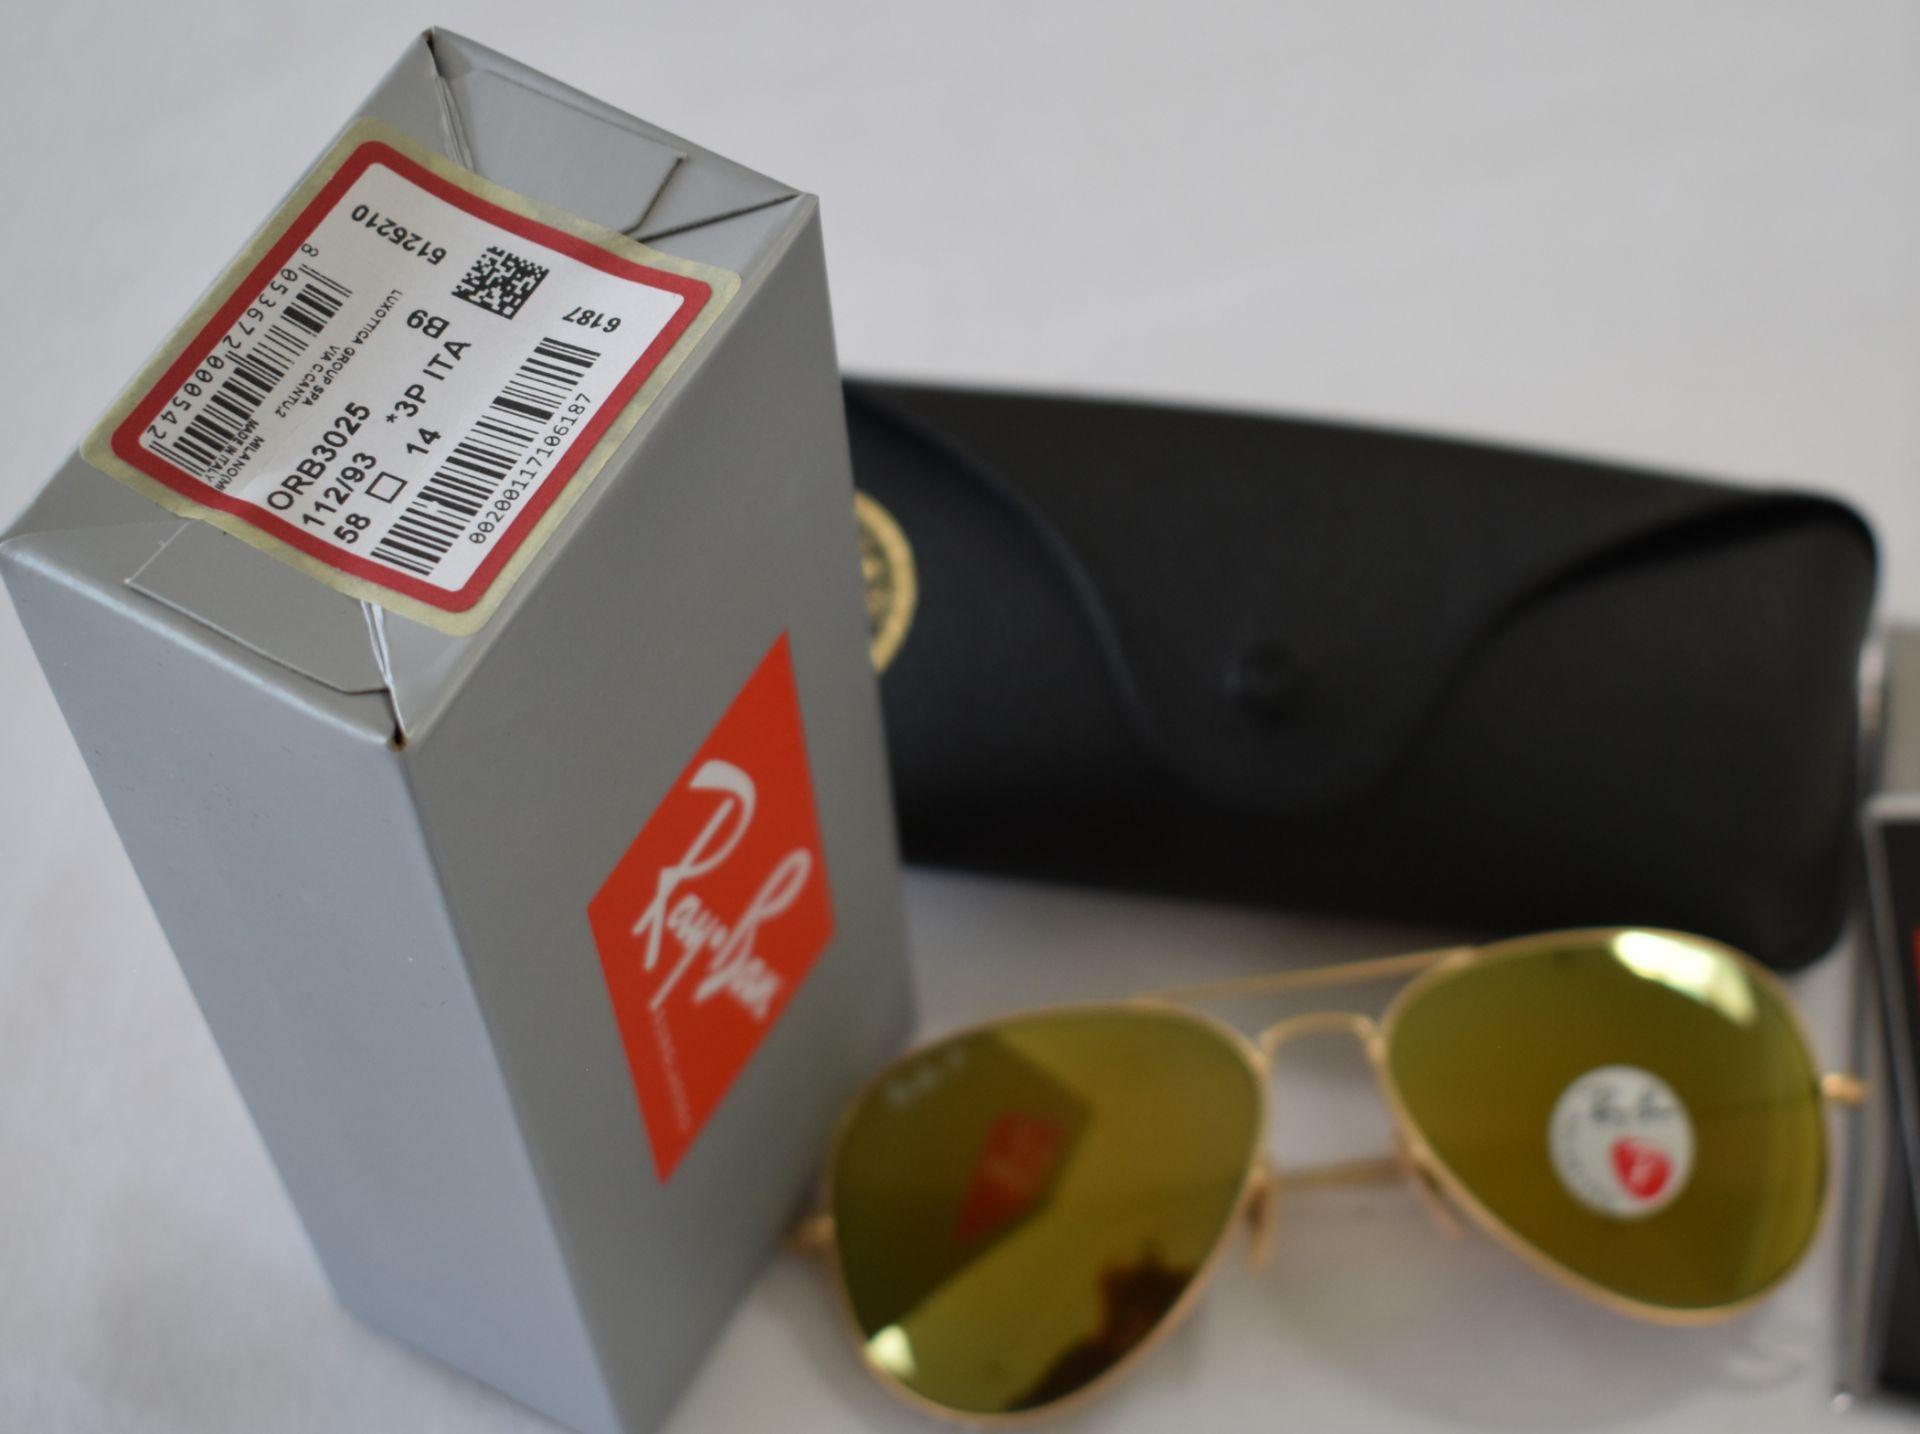 Ray Ban Sunglasses ORB3025 112/93 *3P - Image 2 of 2